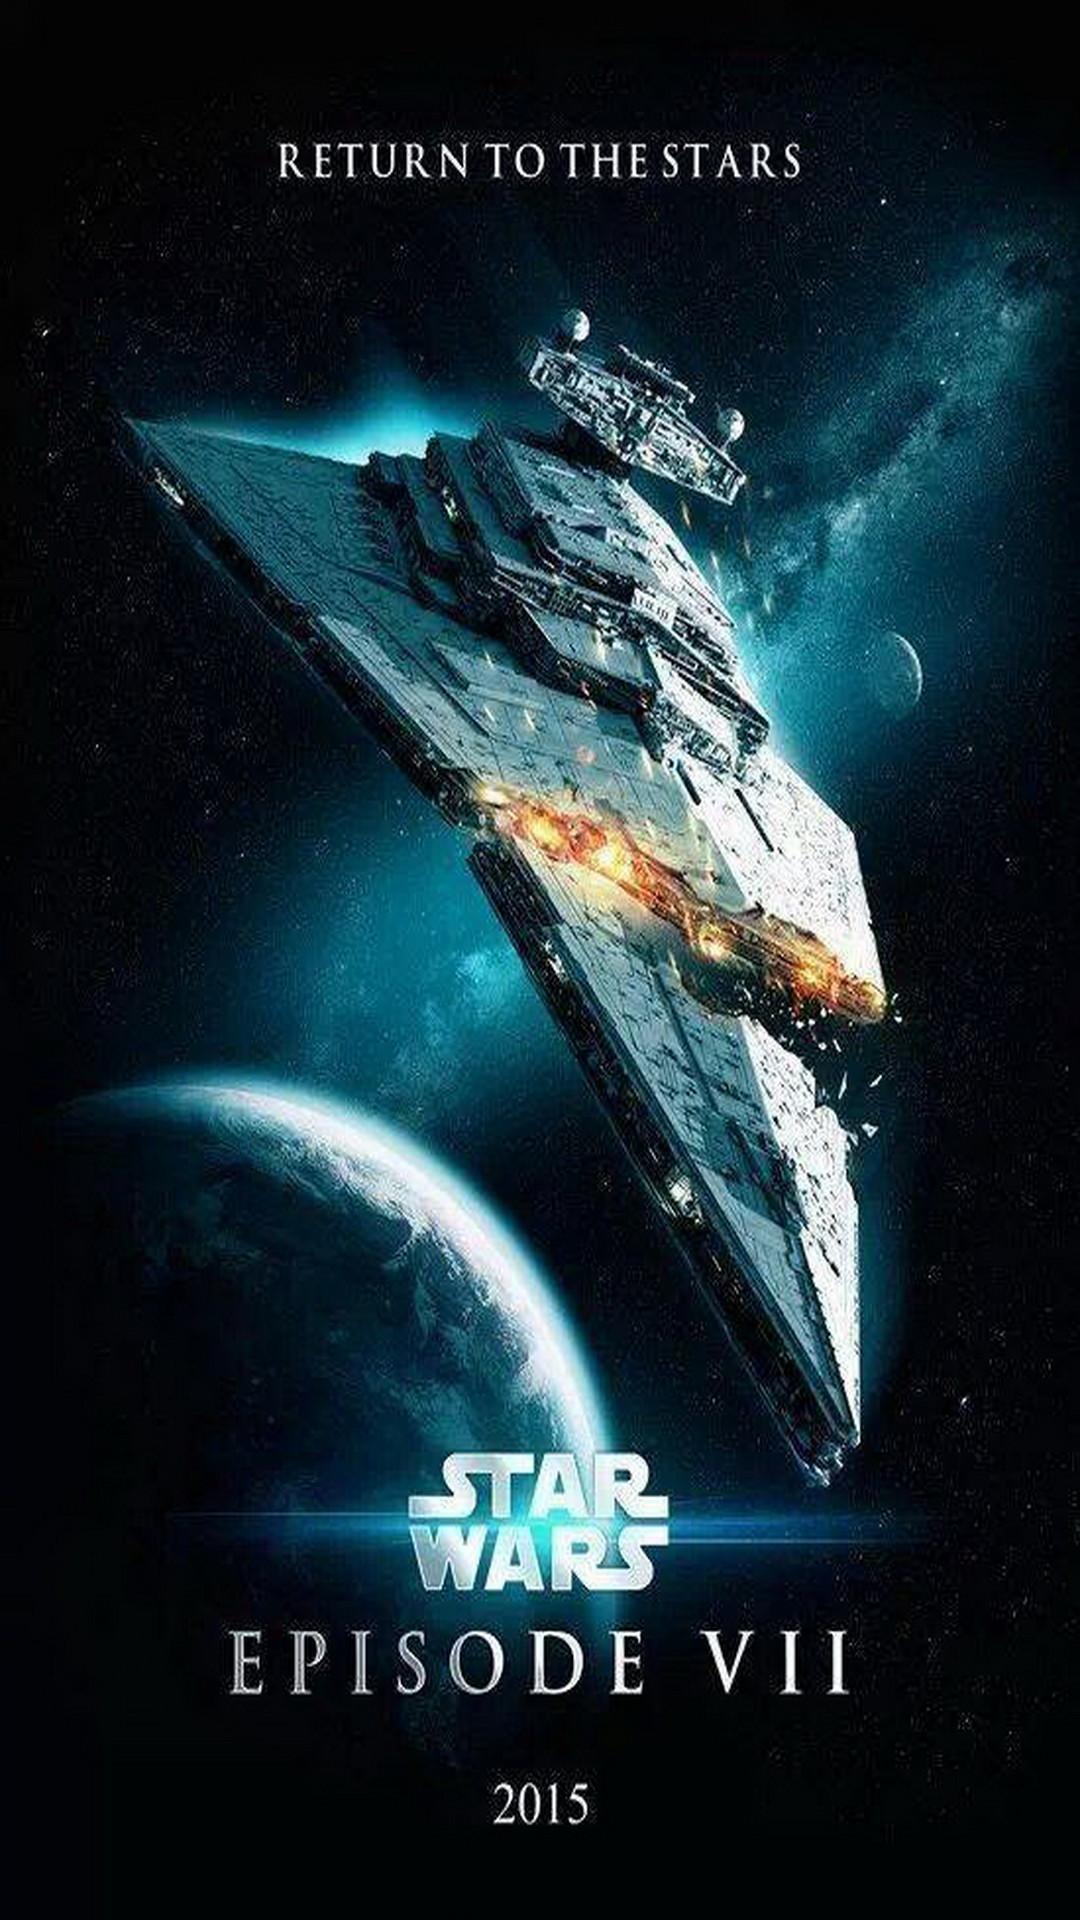 Star Wars Wallpaper 1080x1920 86 Images